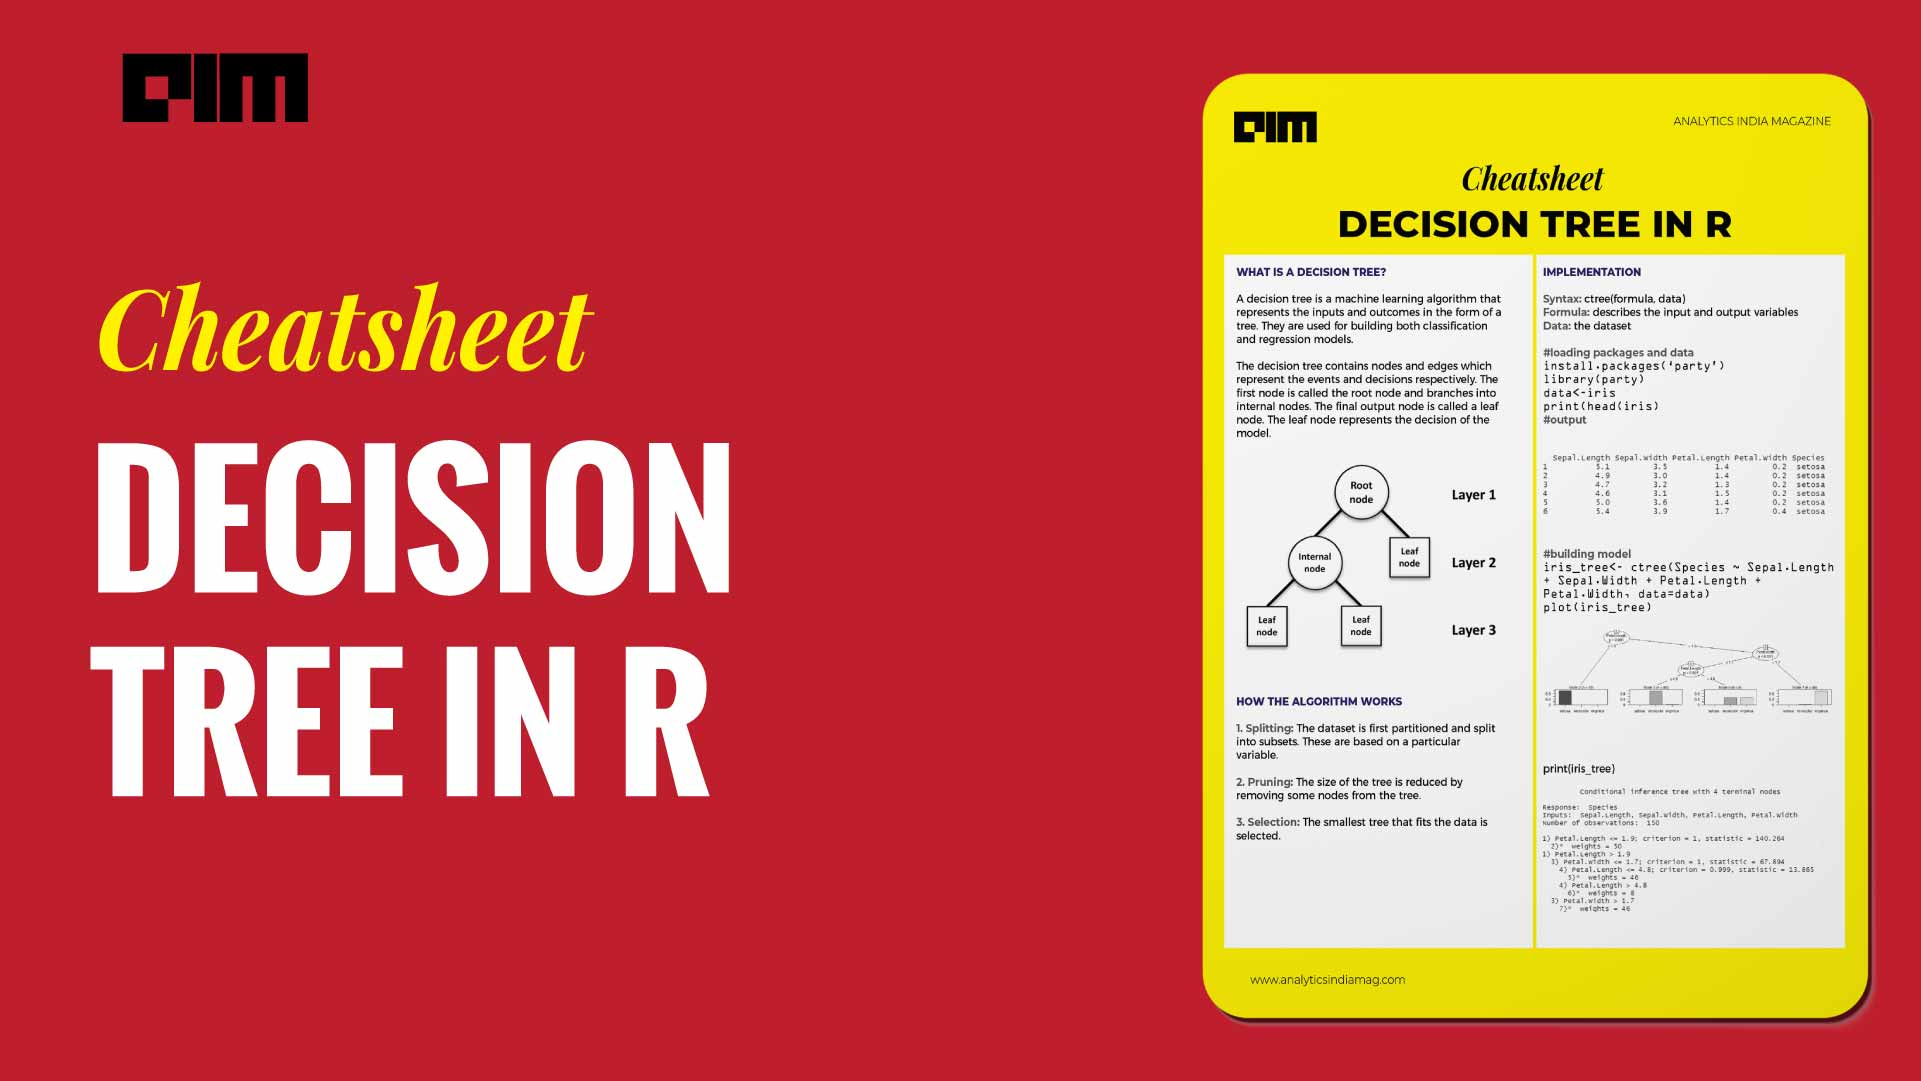 CheatSheet: Decision Tree in R